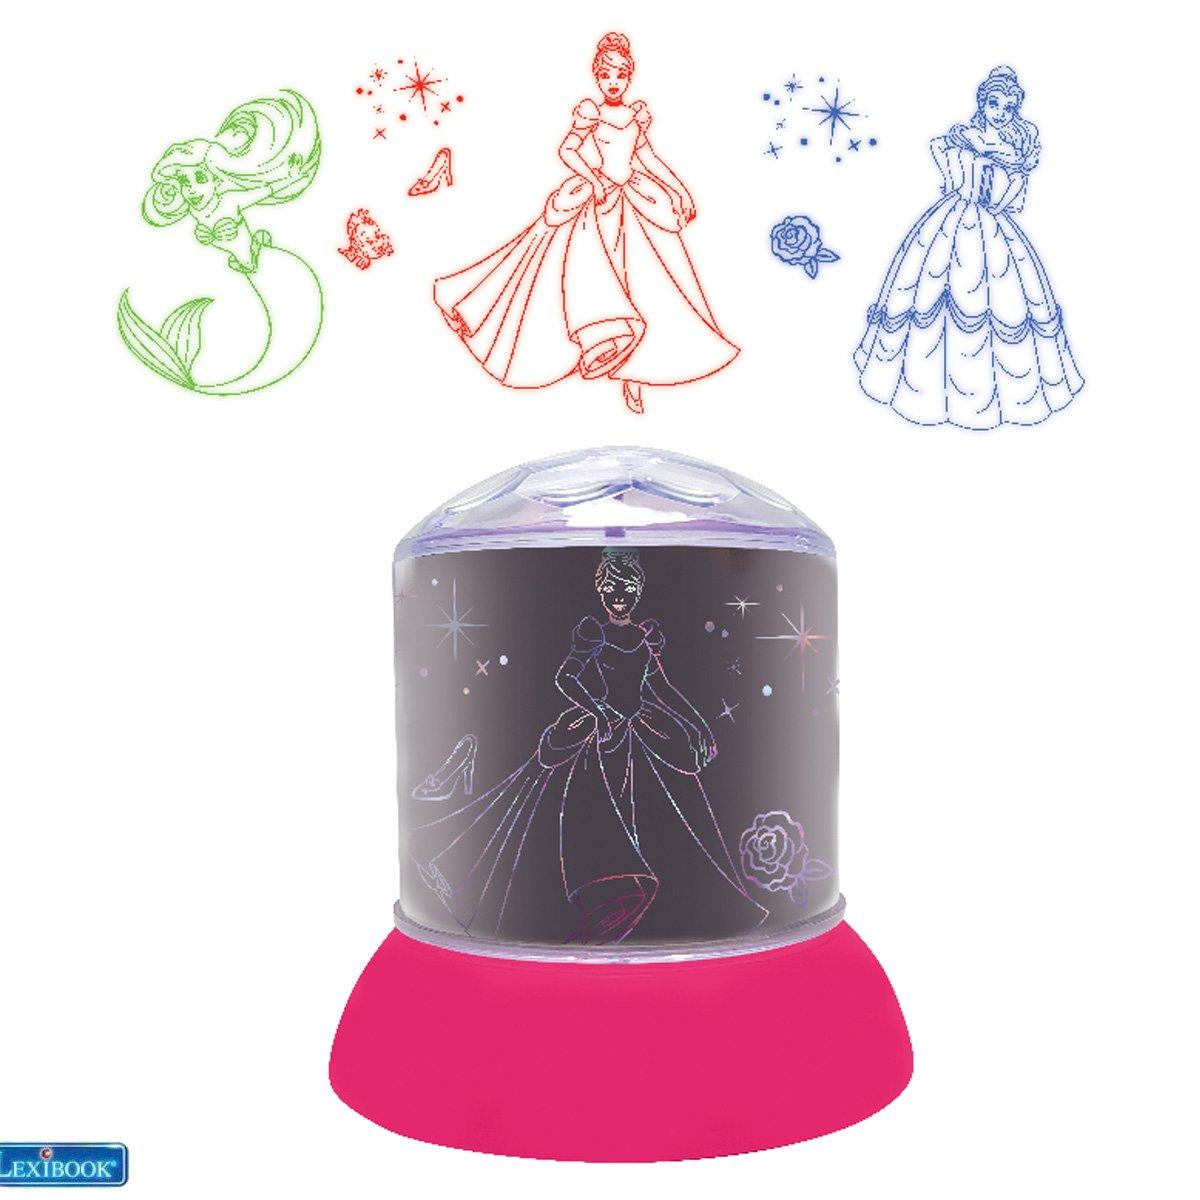 Lexibook - Disney Princess Ceiling Projector Rotative Night Light (NLJ030DP)